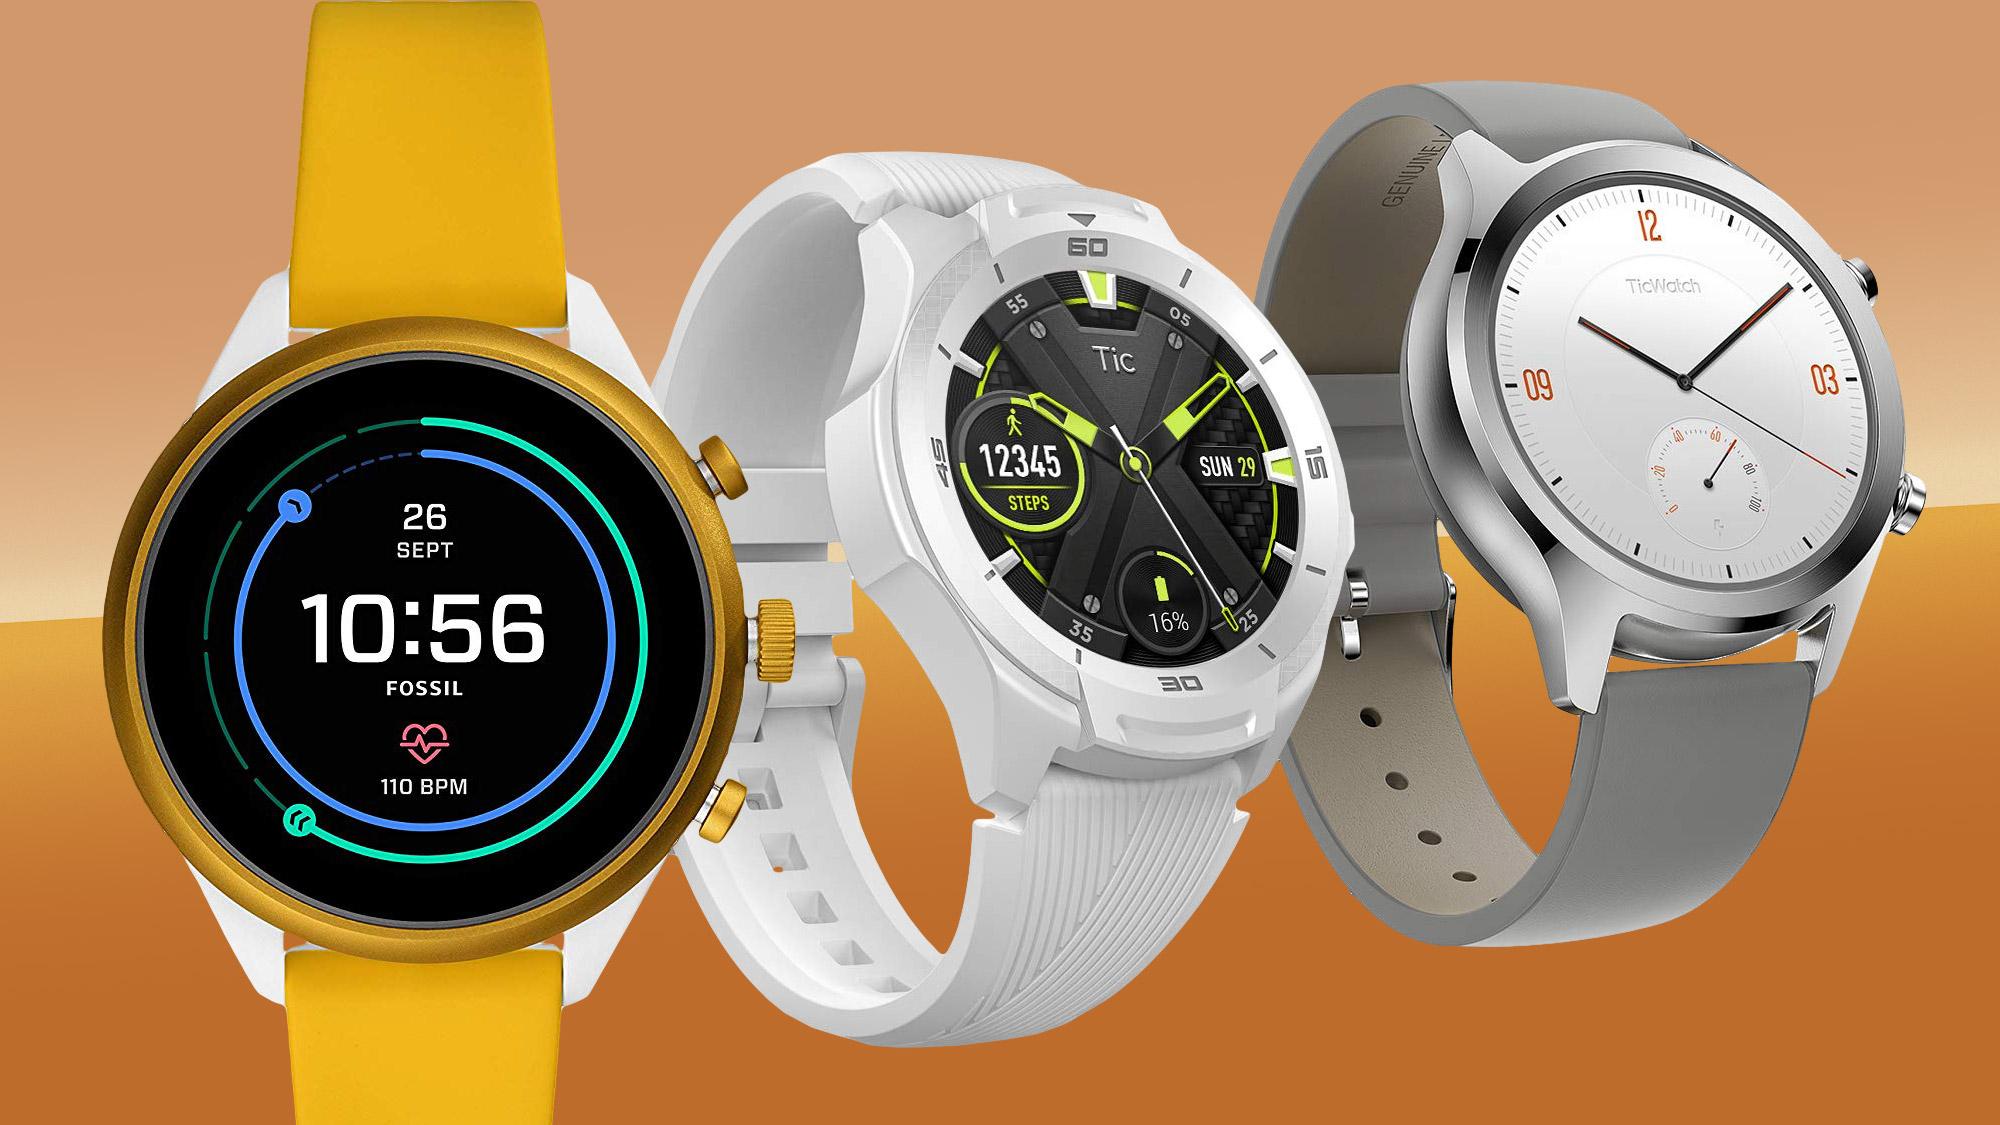 Google Wear OS smartwatches